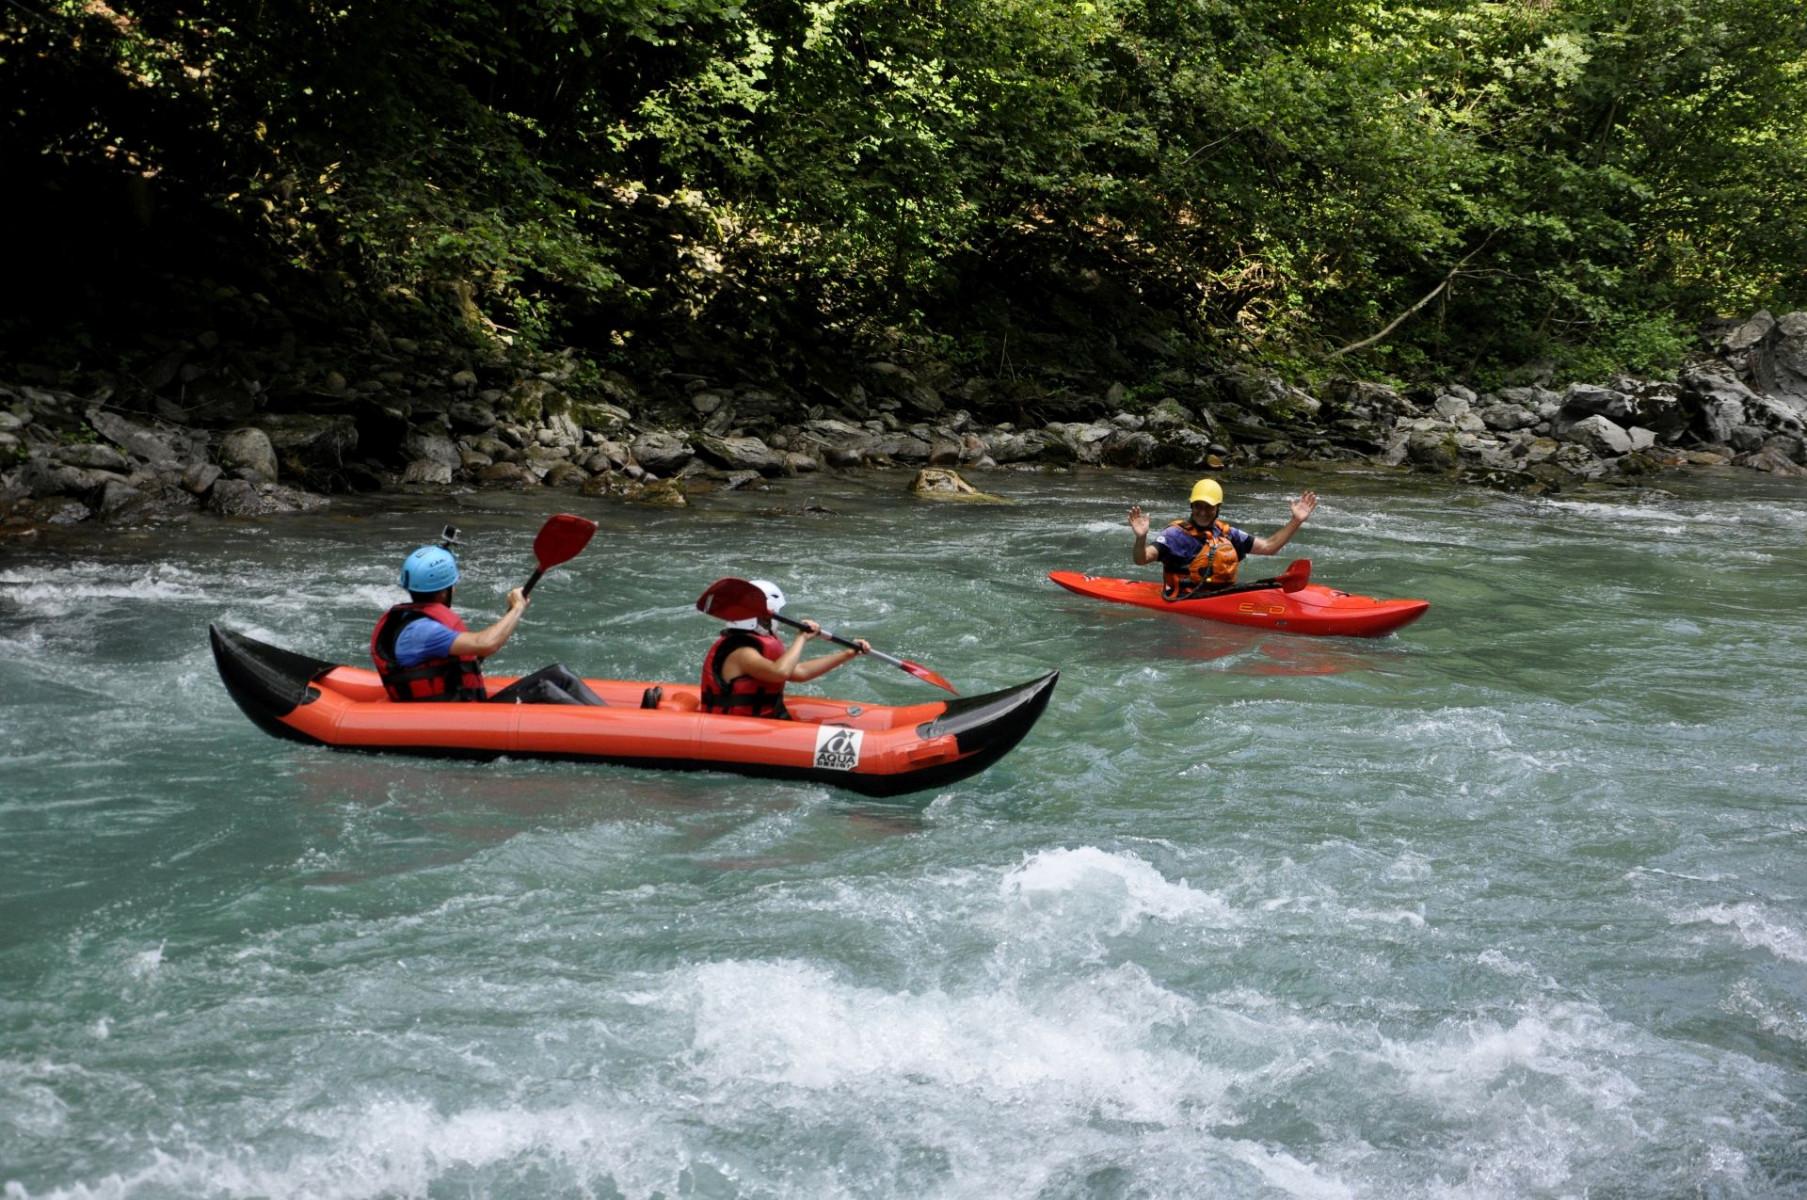 Discesa in kayak raft sul fiume Stura di Demonte